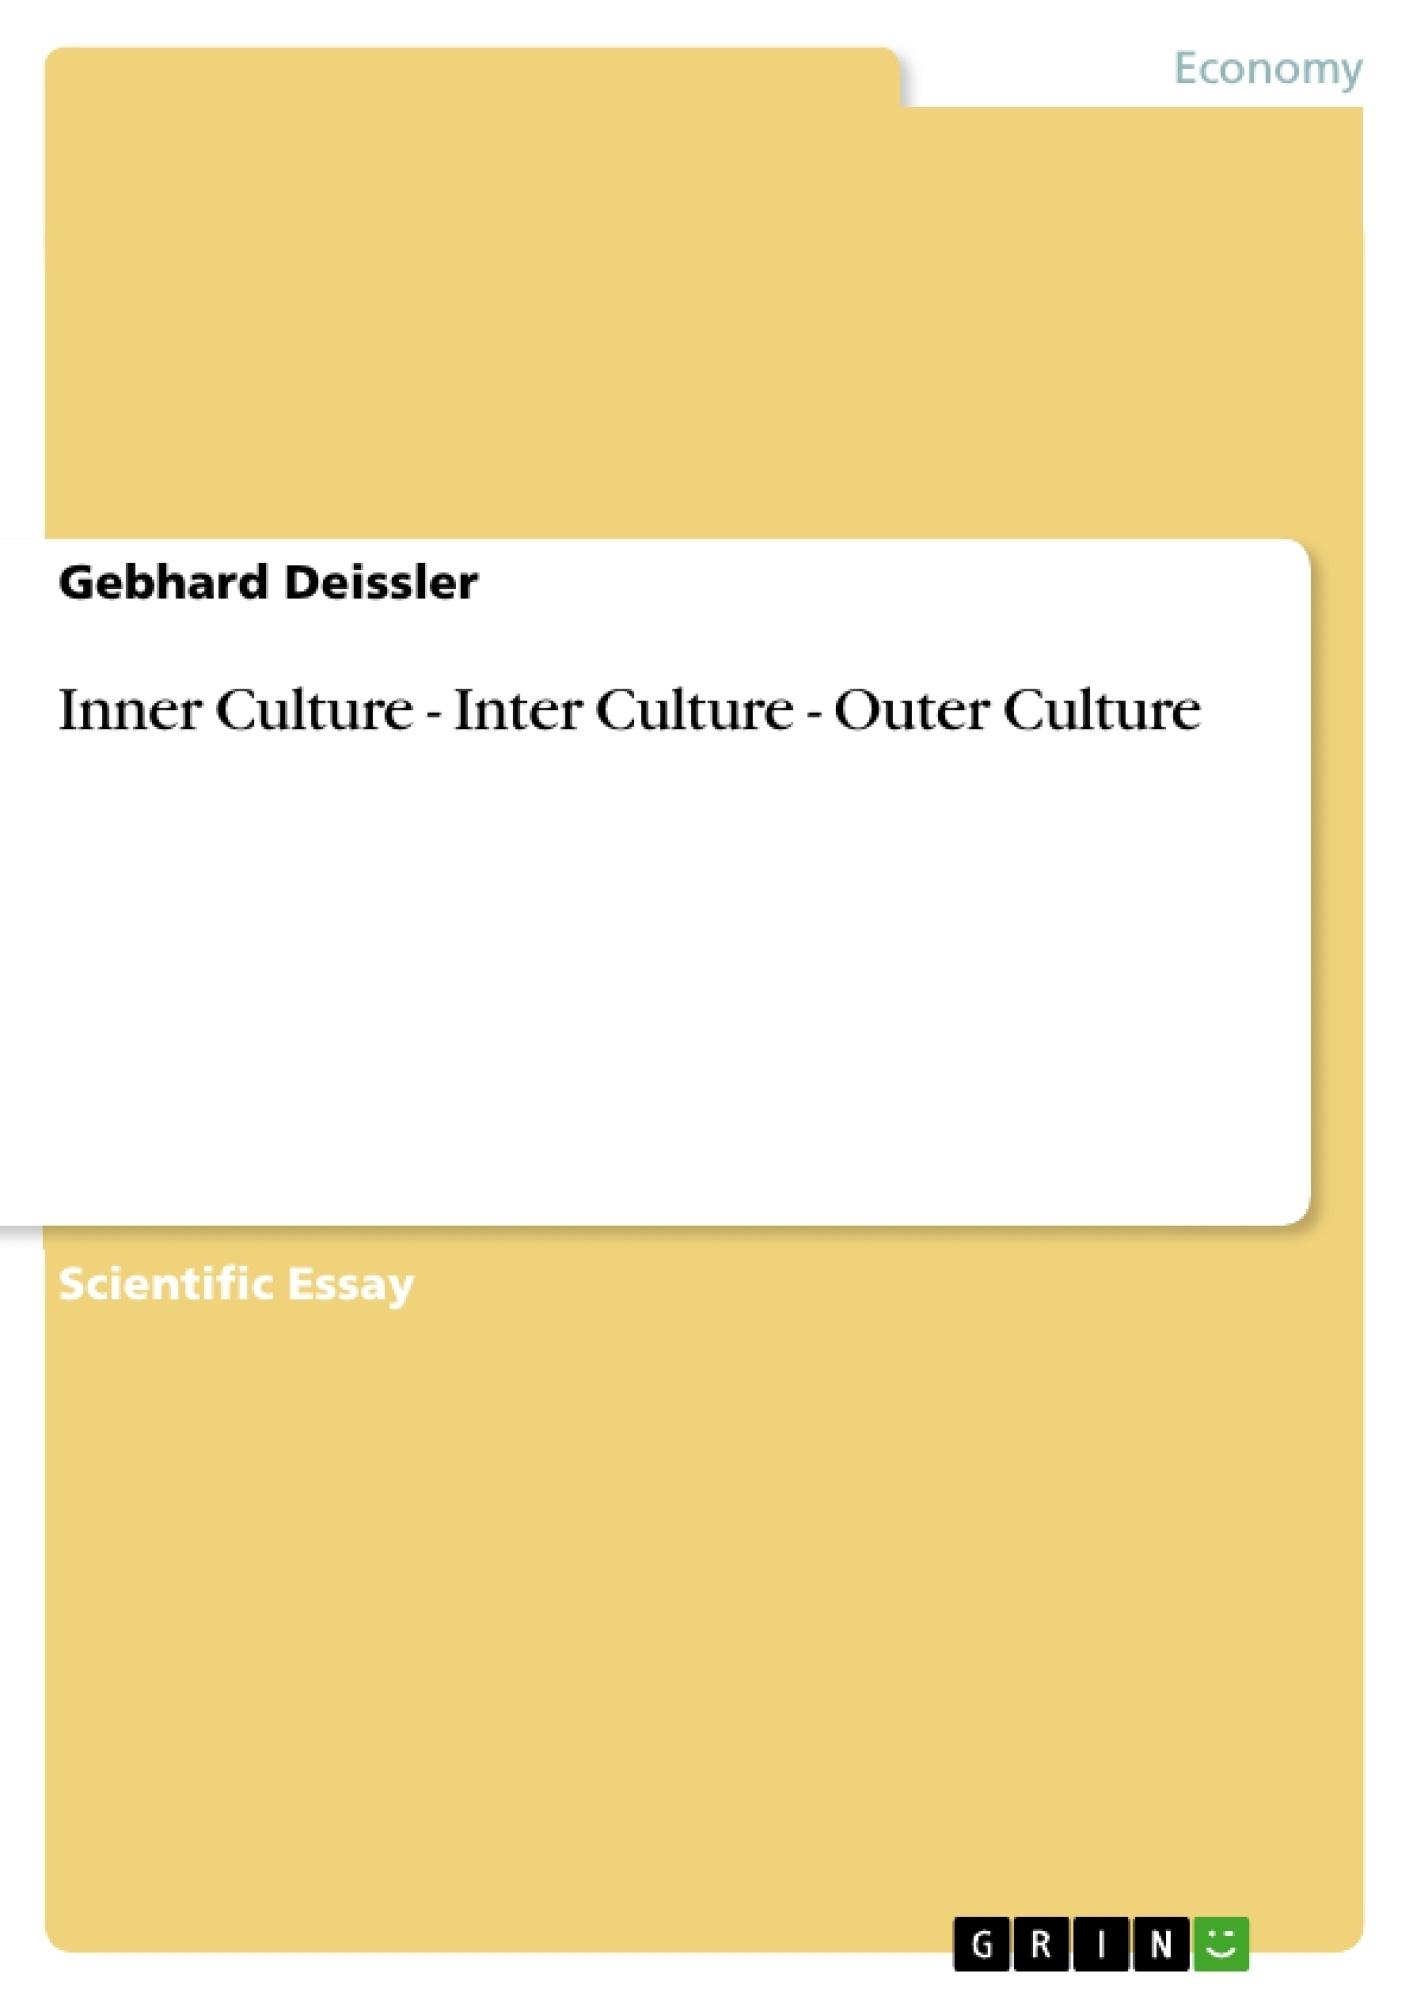 Title: Inner Culture - Inter Culture - Outer Culture